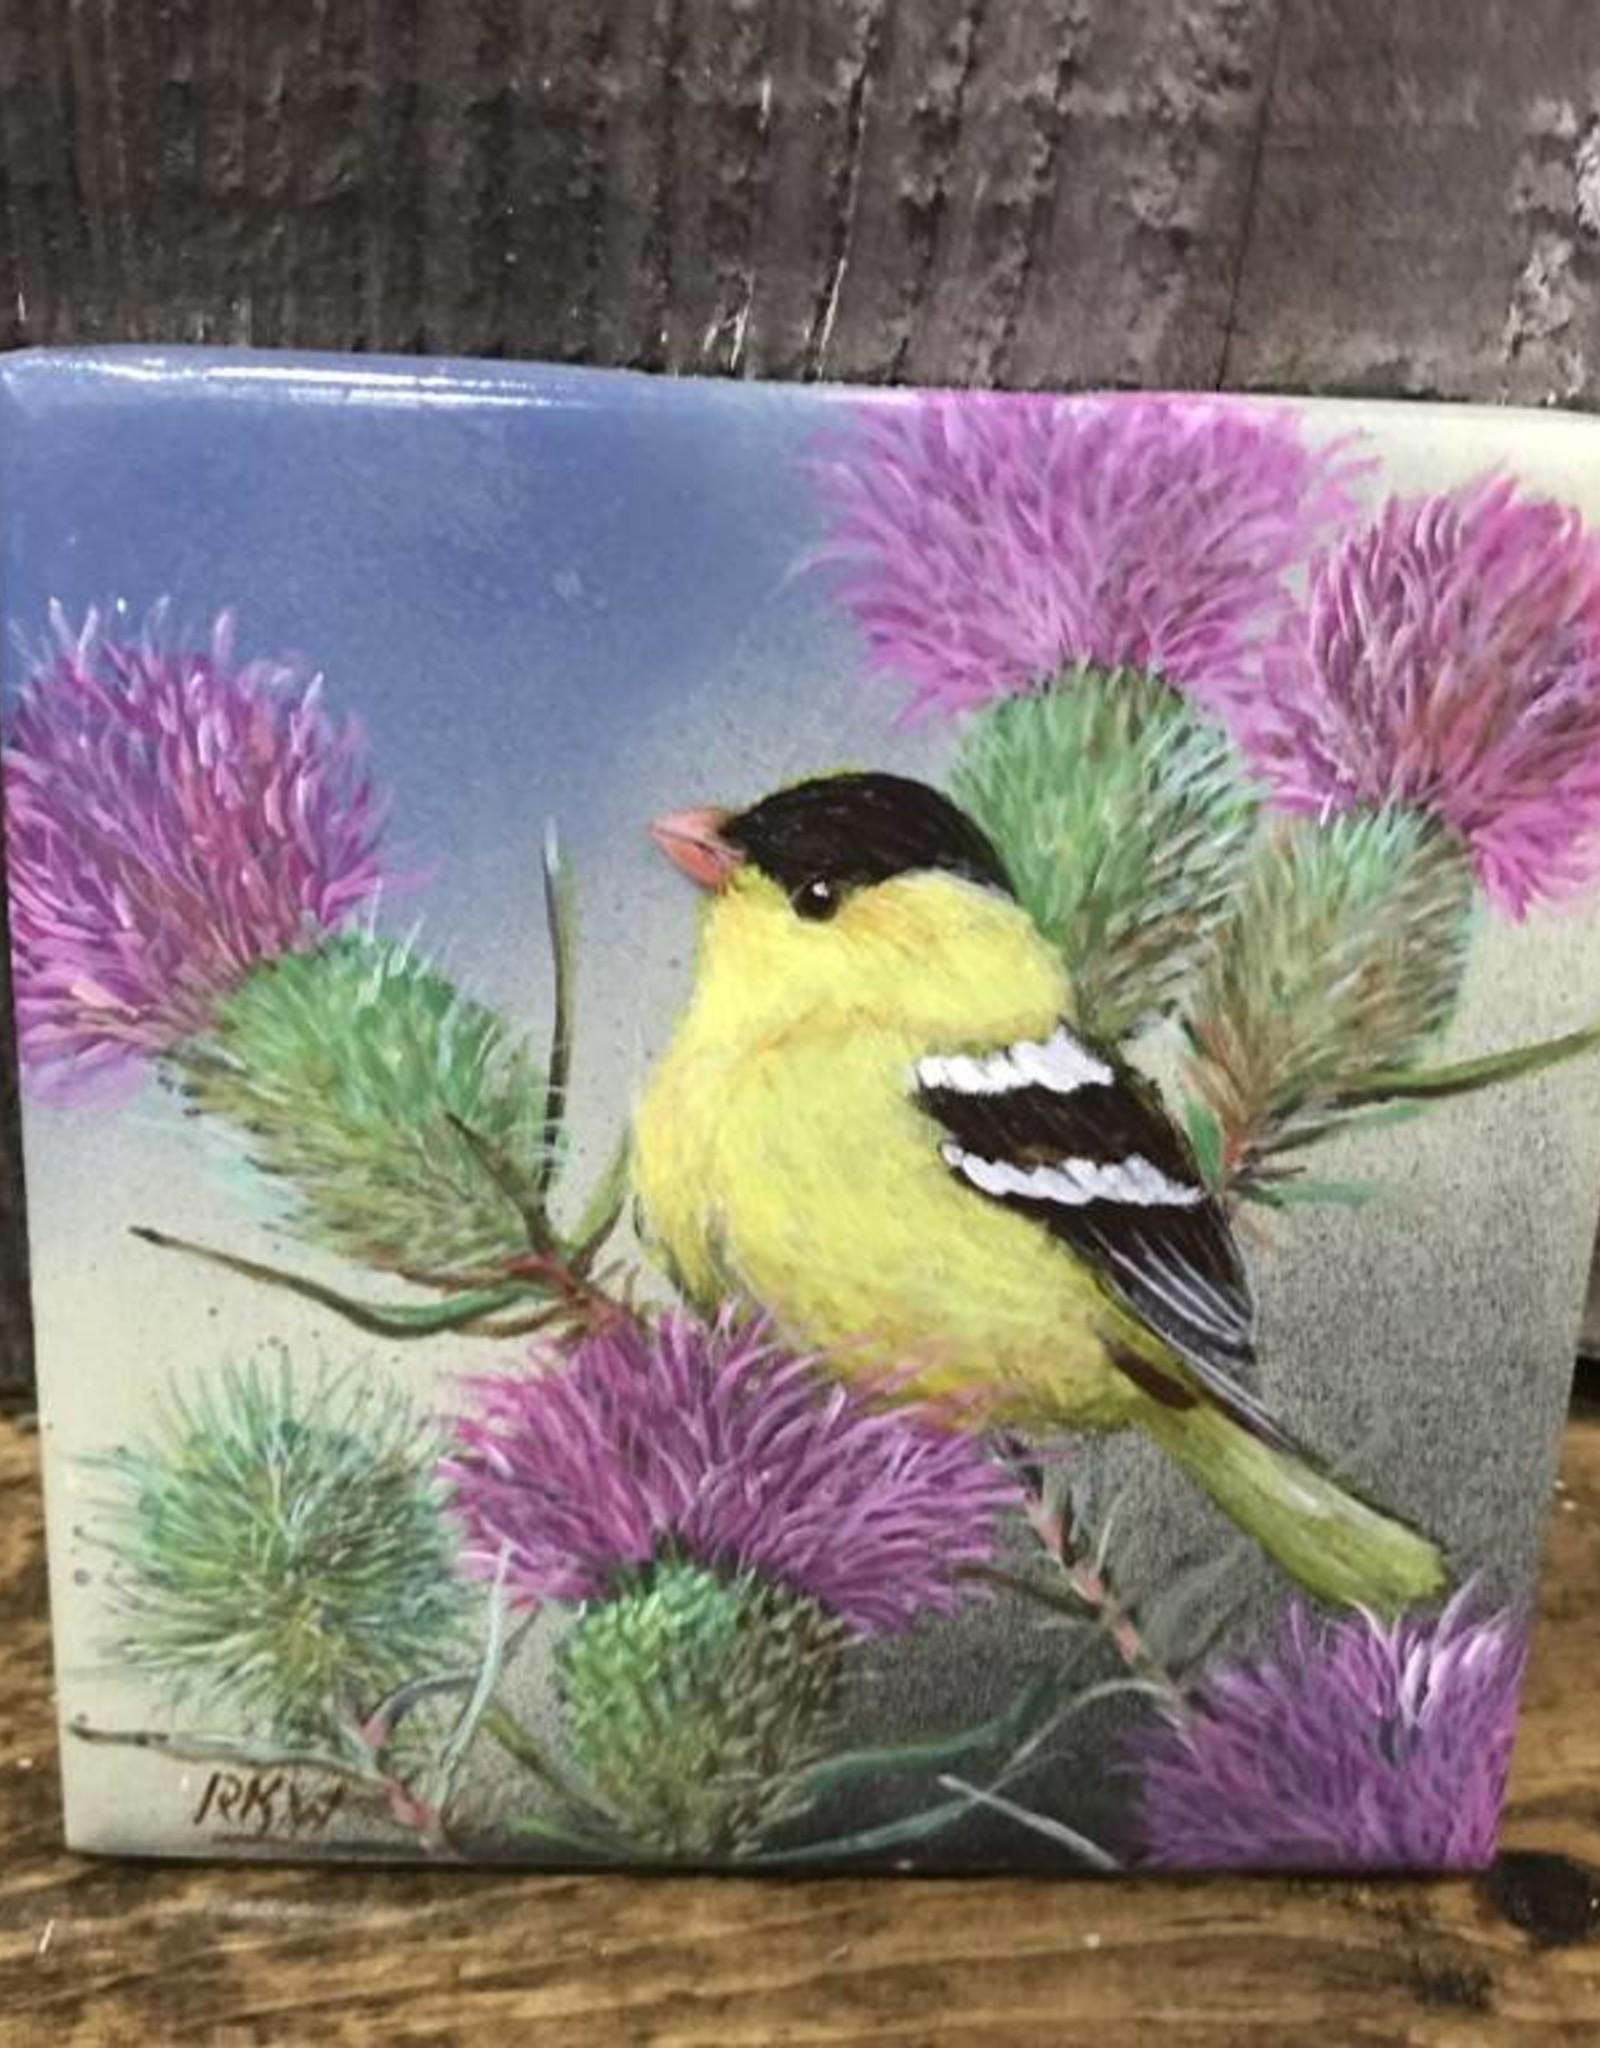 Ron Wetzel Art Handpainted Tile - Finch & Thistles